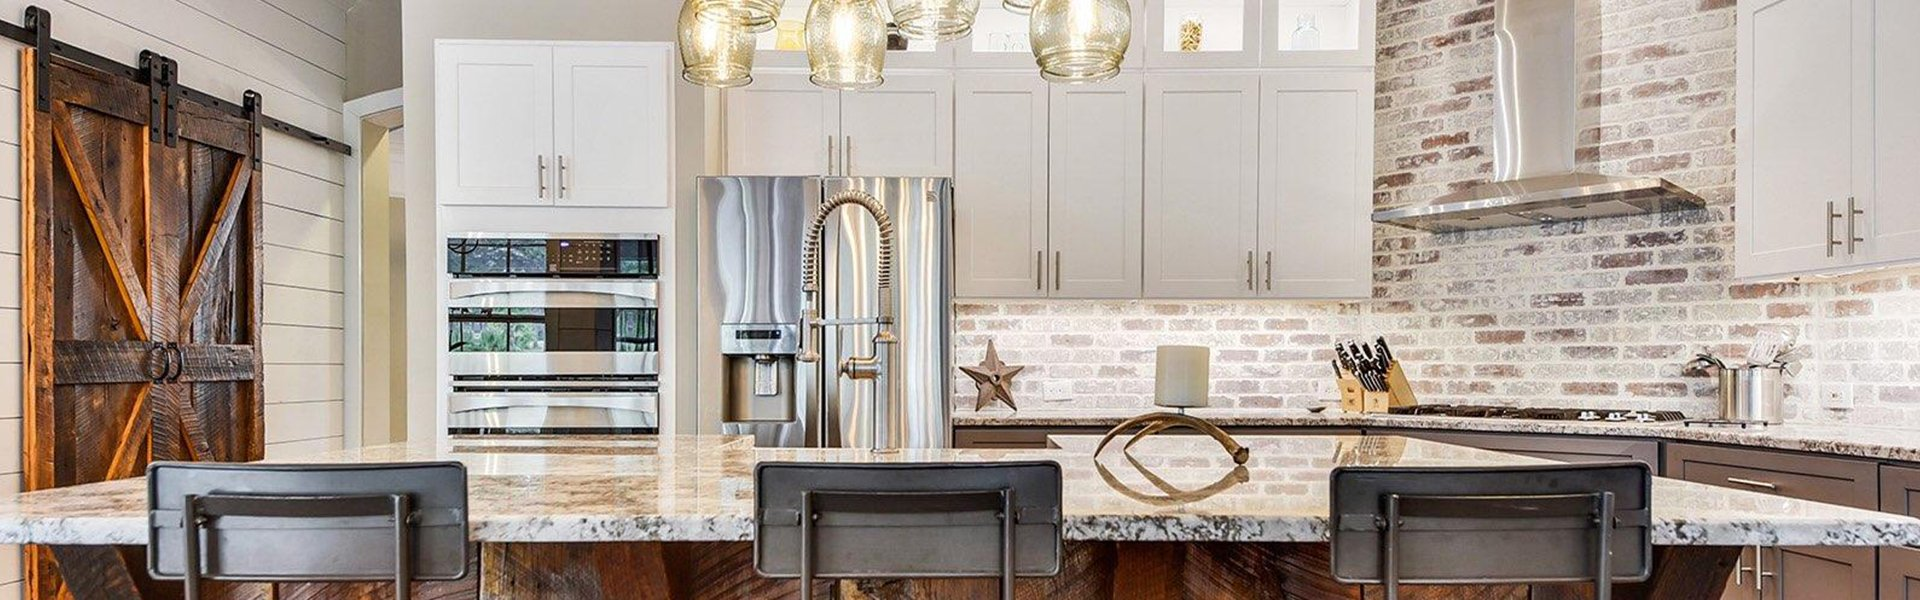 New Kitchen Cabinets In Jacksonville Fl